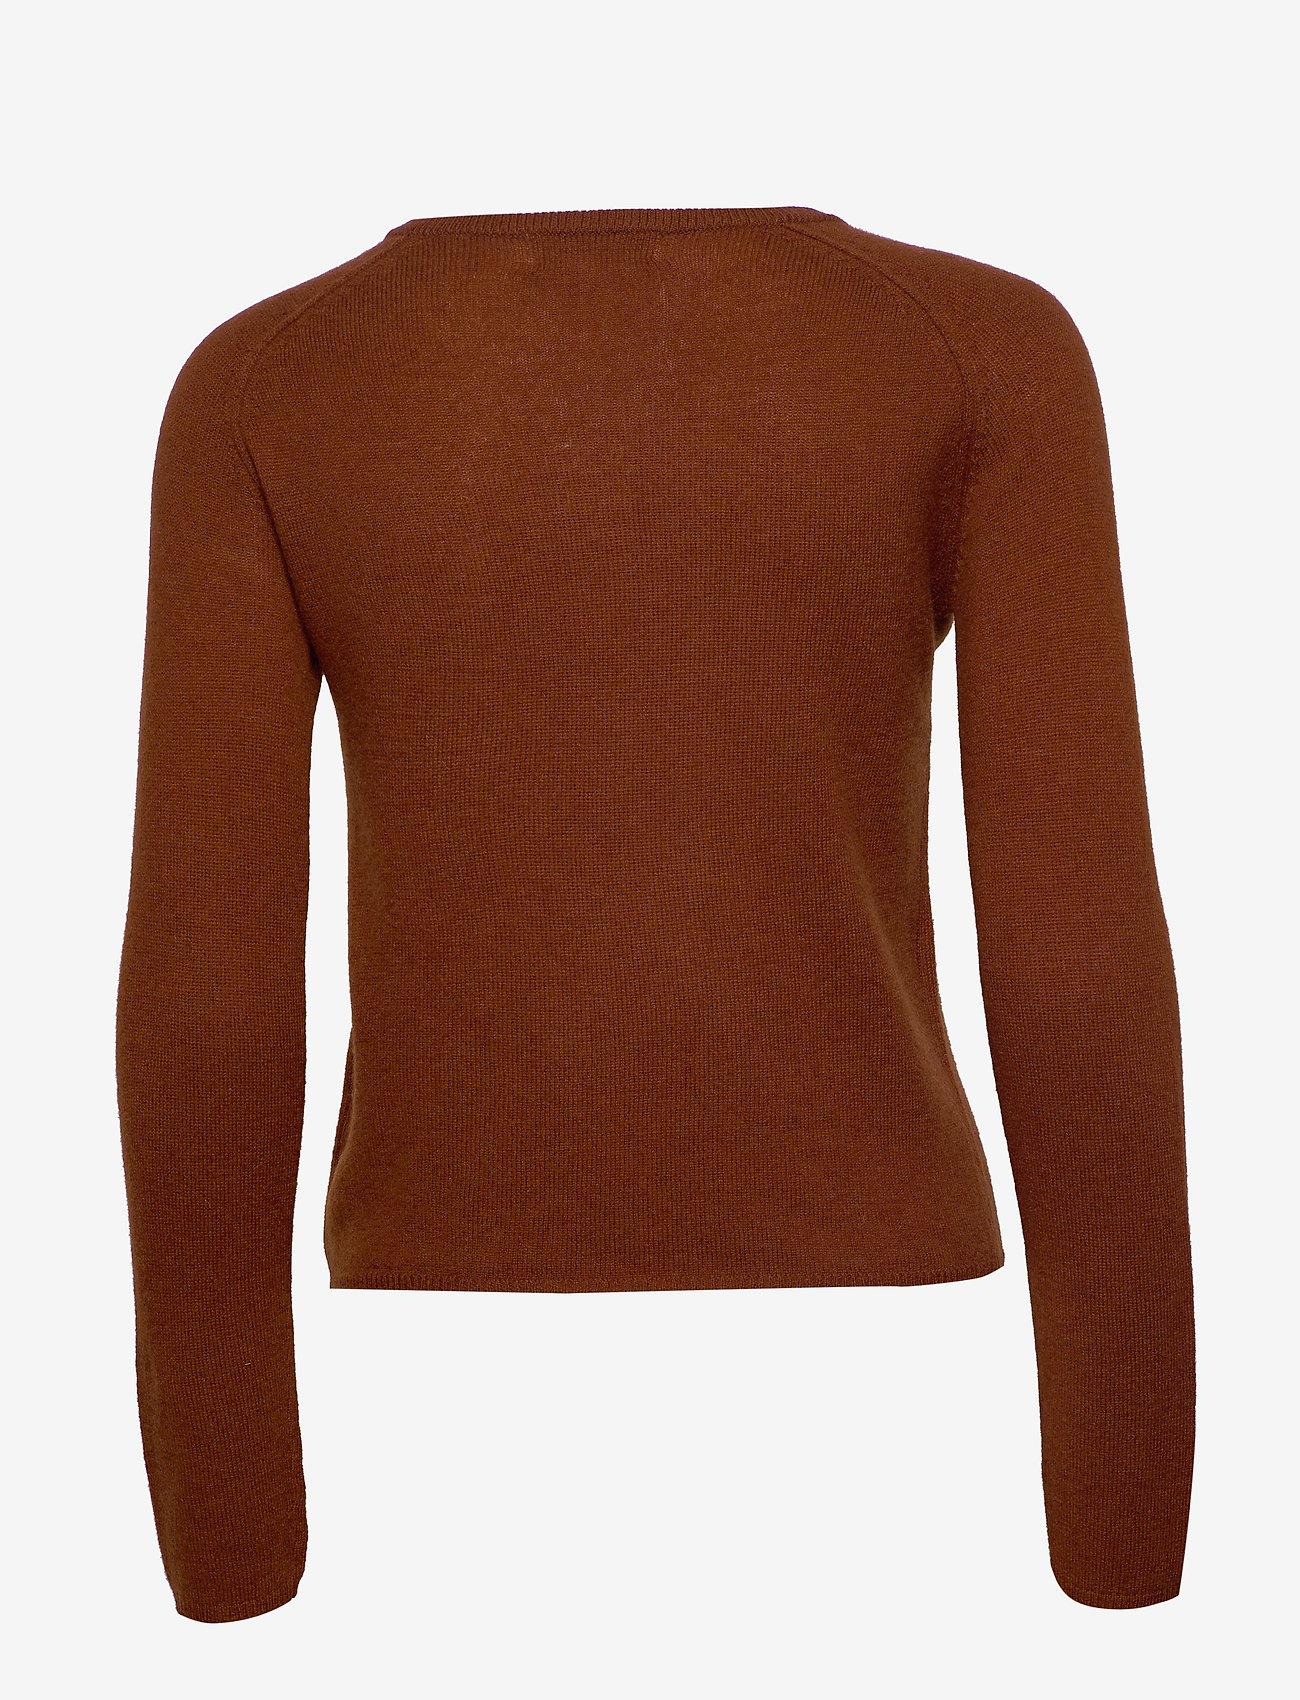 Rosemunde - Wool & cashmere cardigan ls - kashmir - amber brown - 1